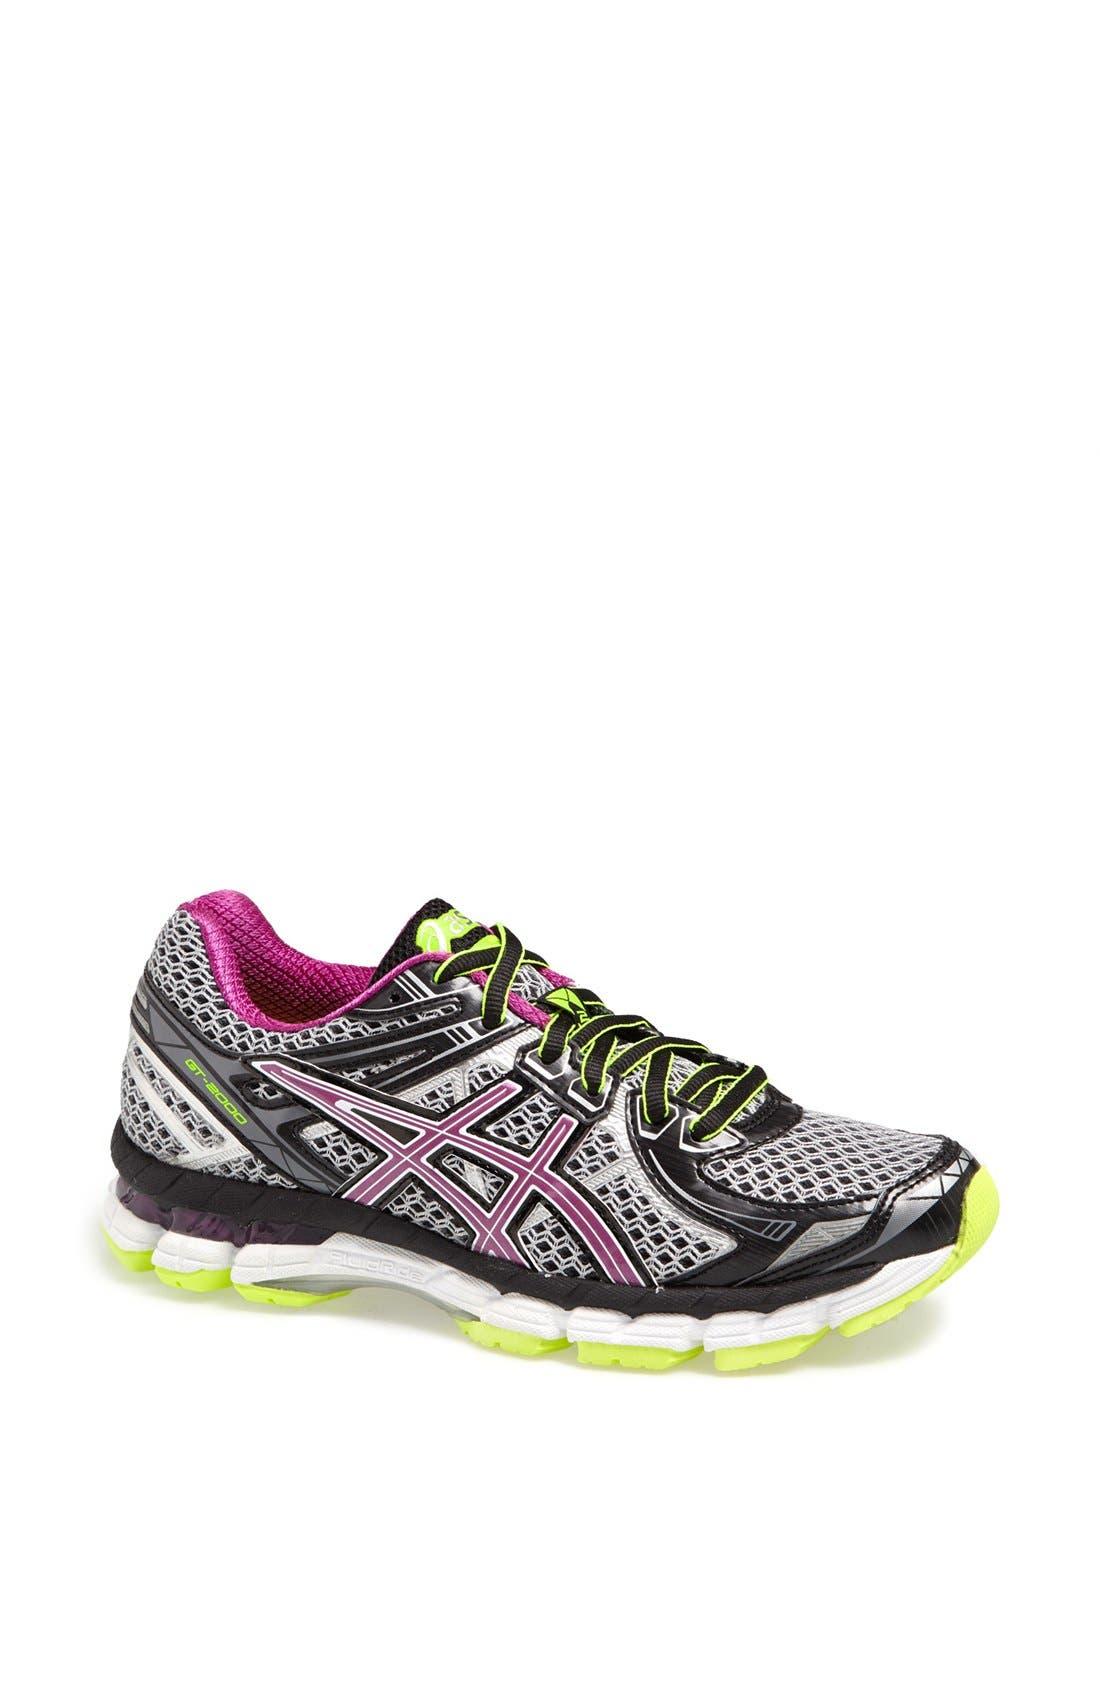 Main Image - ASICS® 'GT-2000 2 BR' Running Shoe